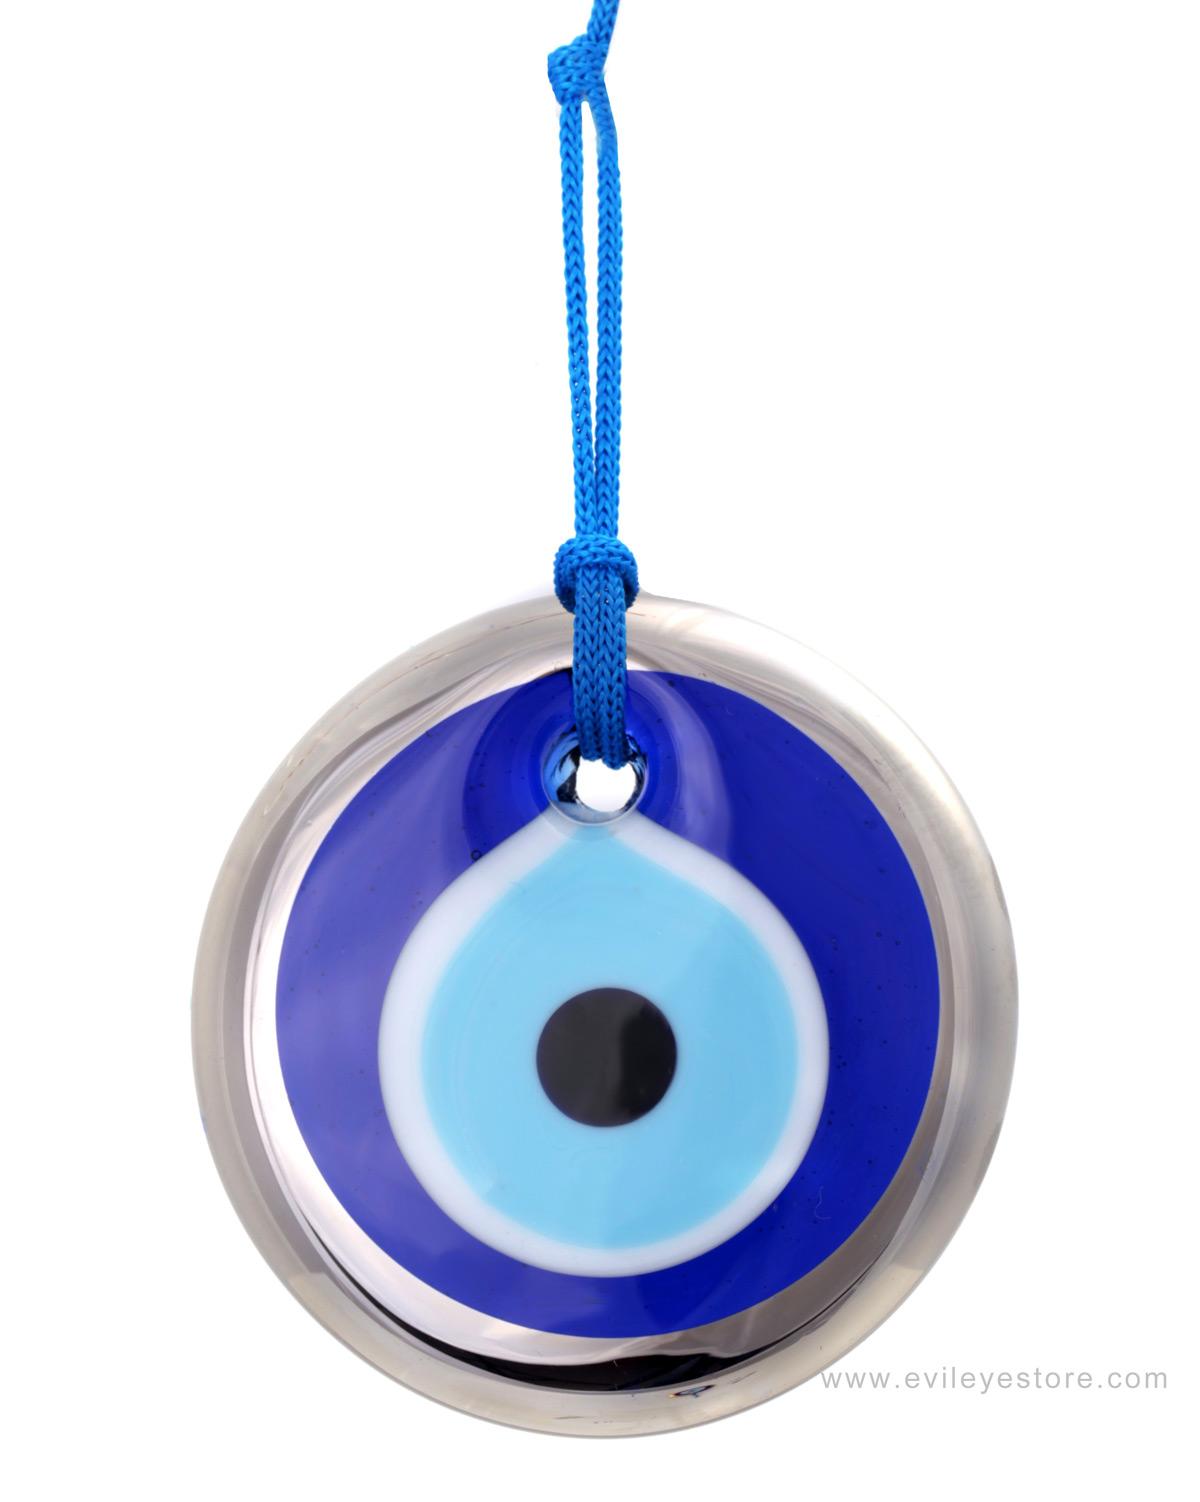 Amuleto Ojo Turco Azul